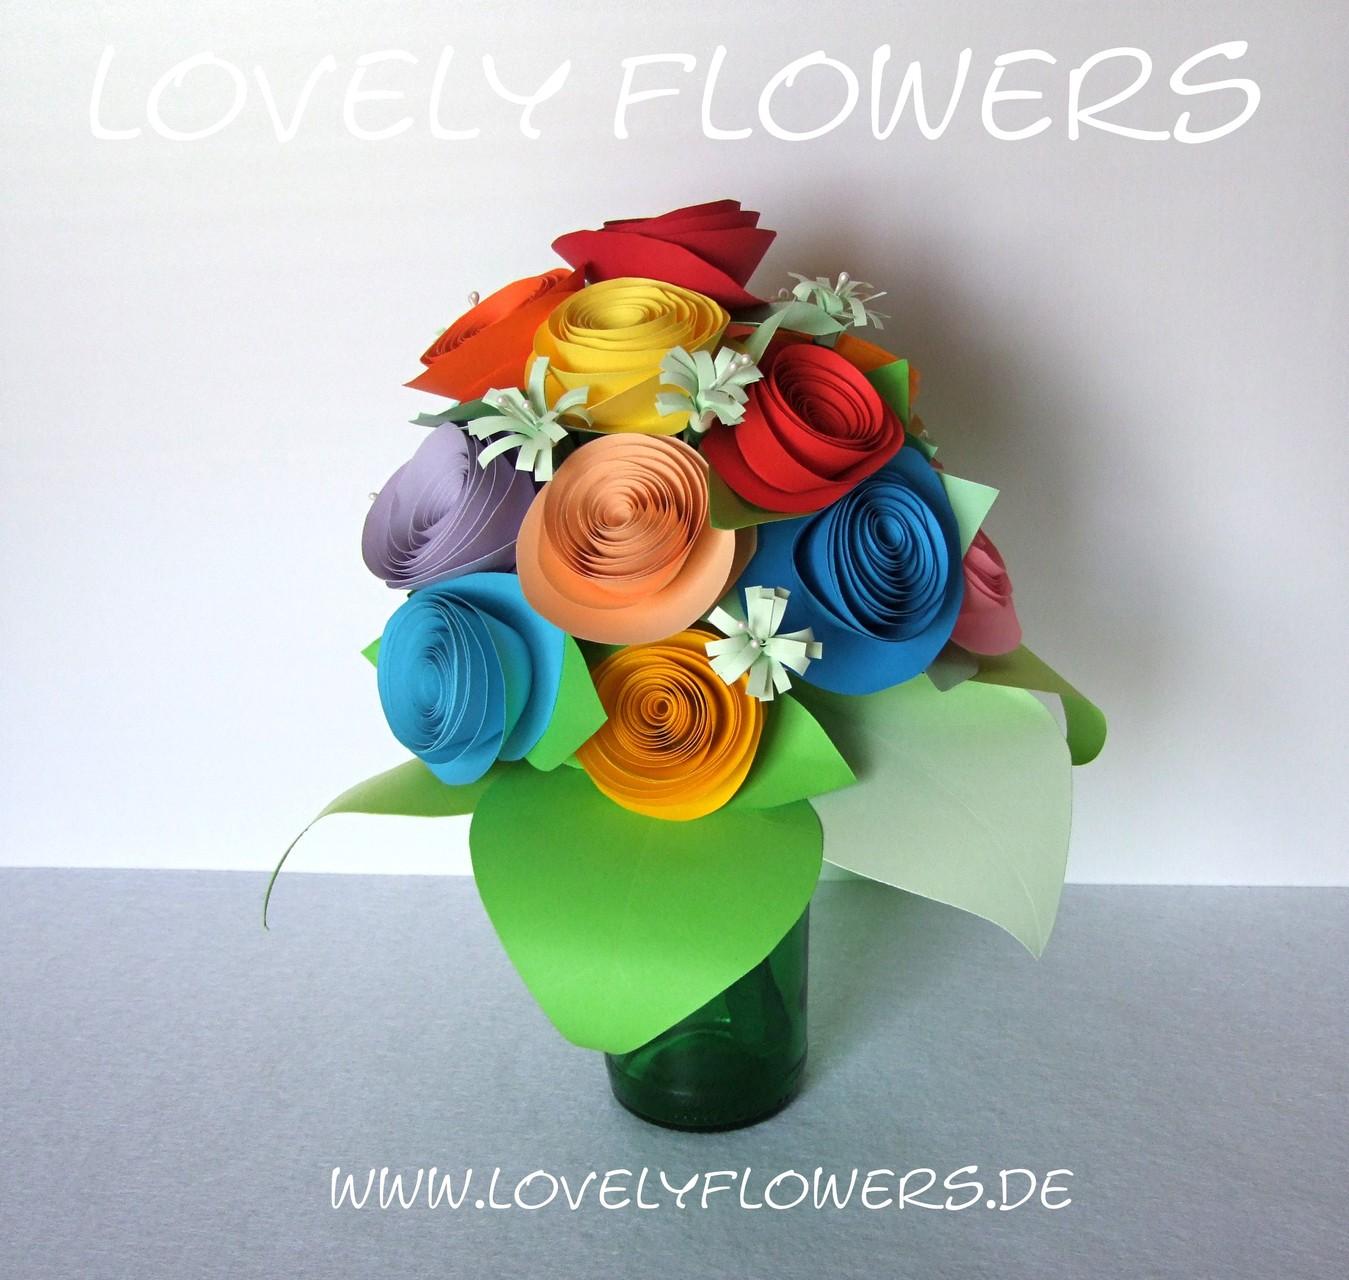 www.lovelyflowers.de - Dein Spezialist für PAPER-ART Blumenbouquets nach Feng Shui!